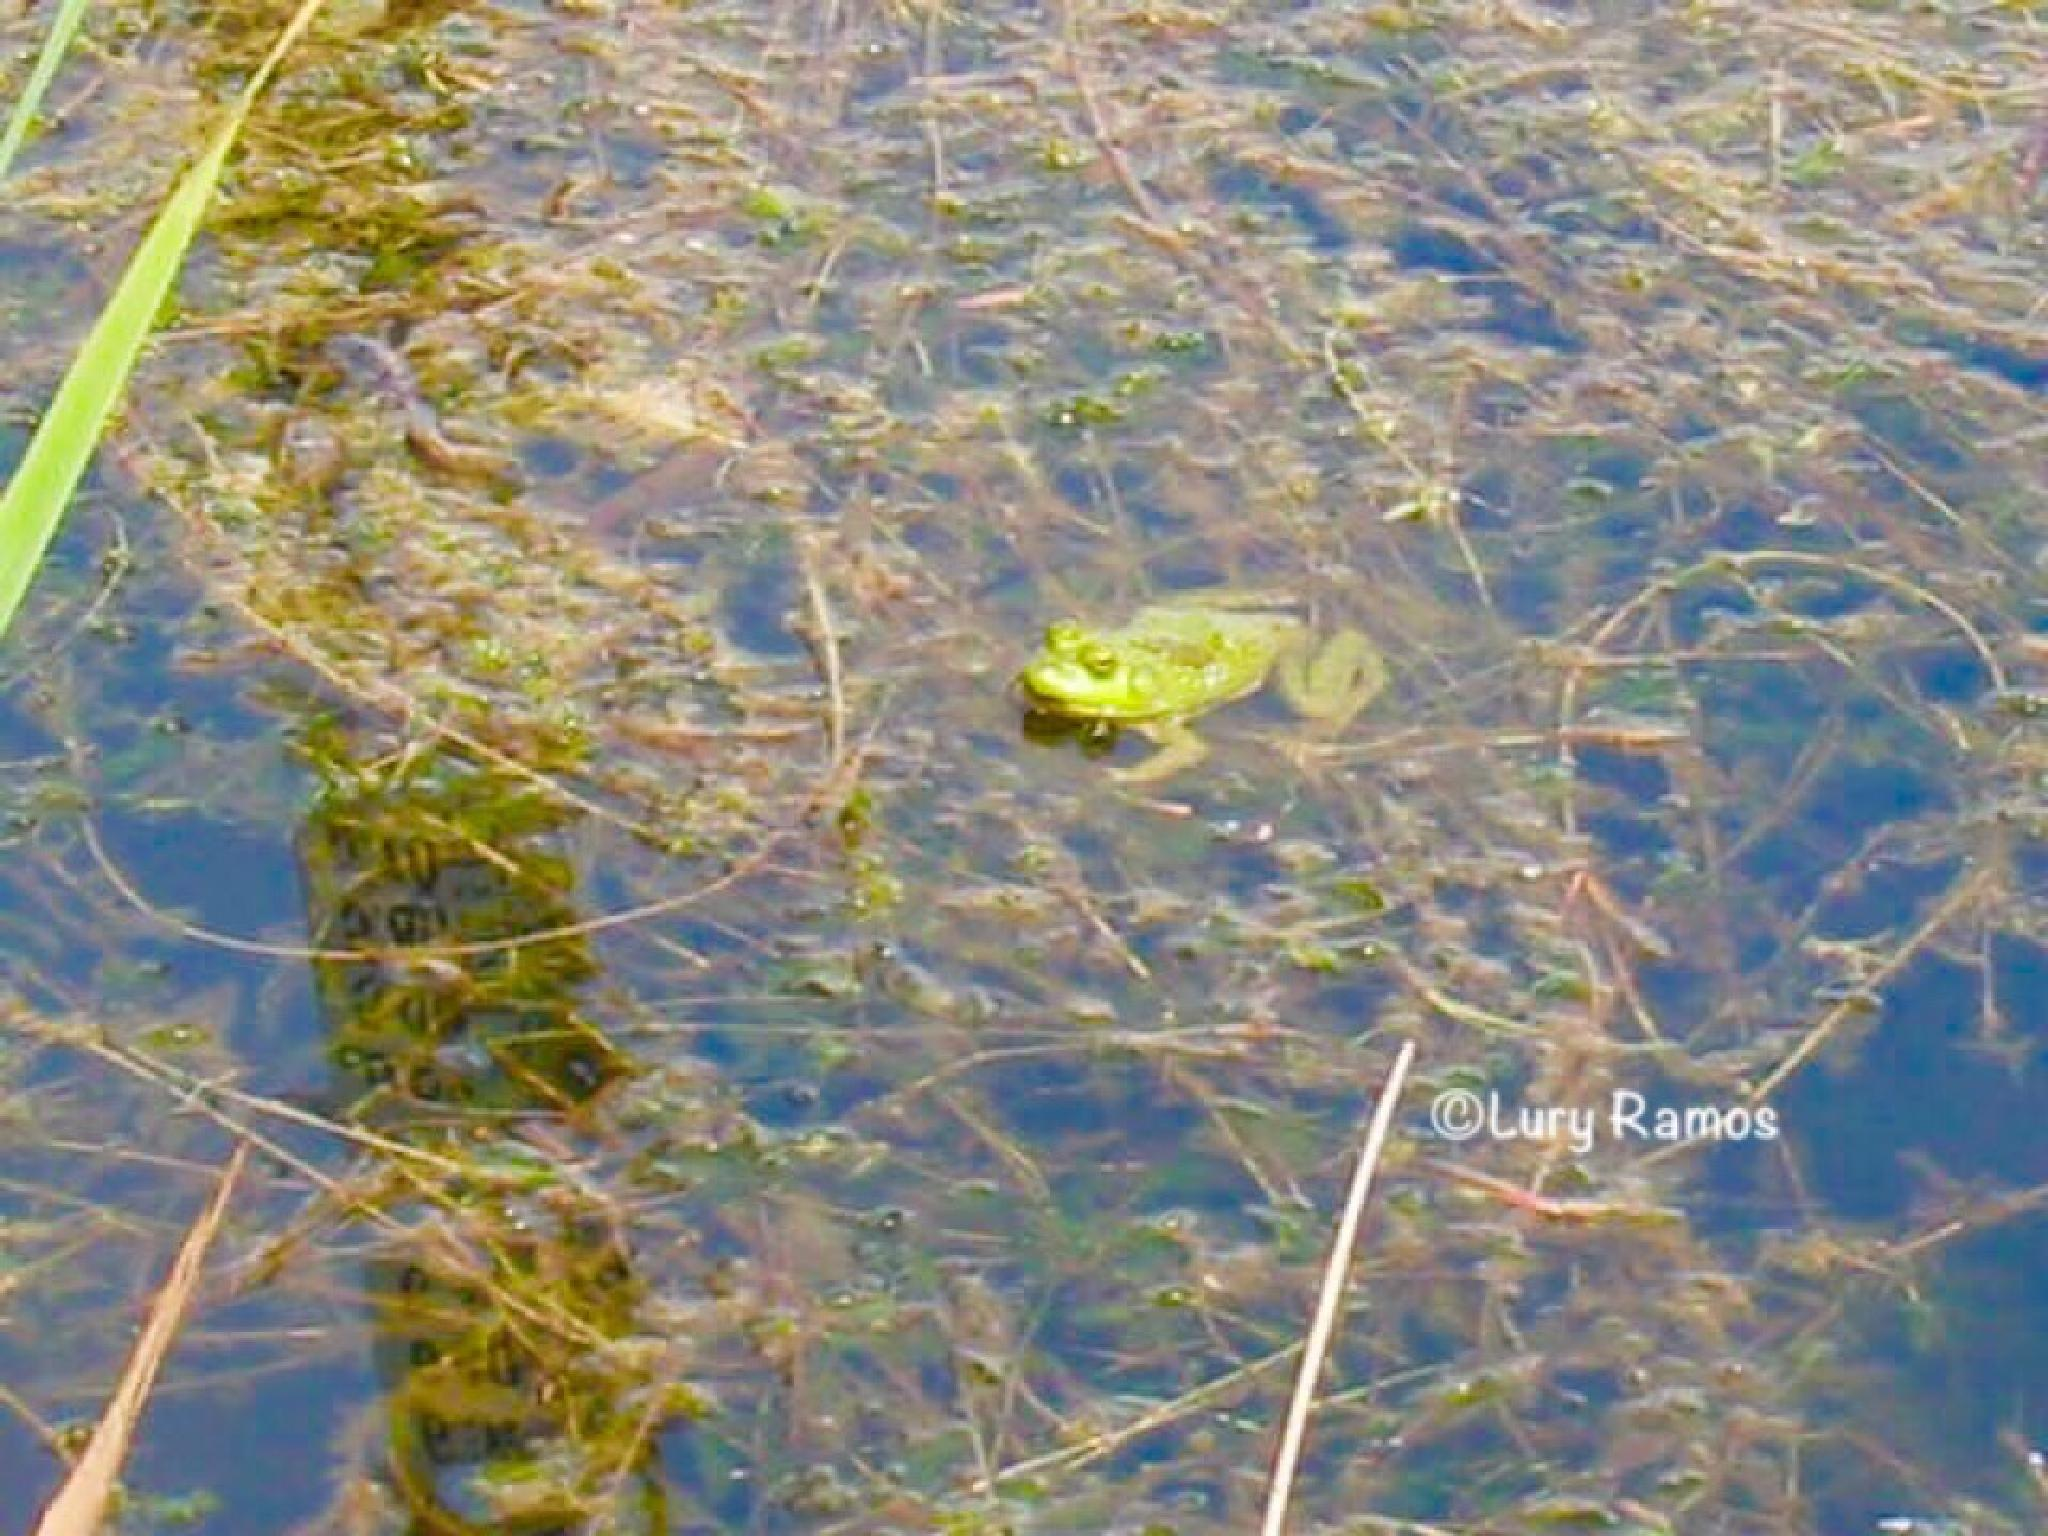 Frog by Lury Ramos